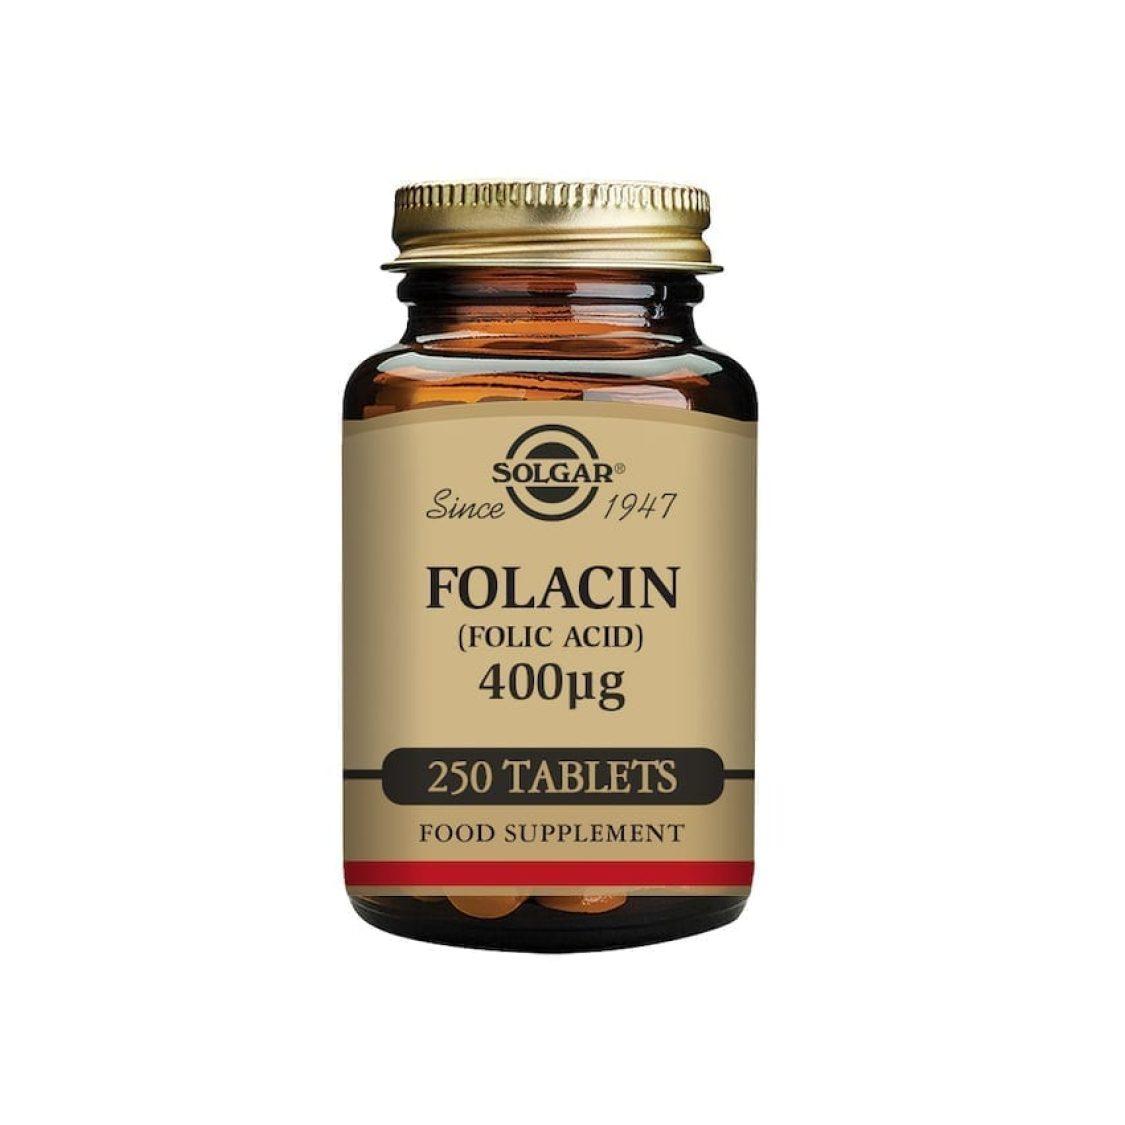 Solgar - Vitamin B - Folacin Tabs 400ug - Size: 250